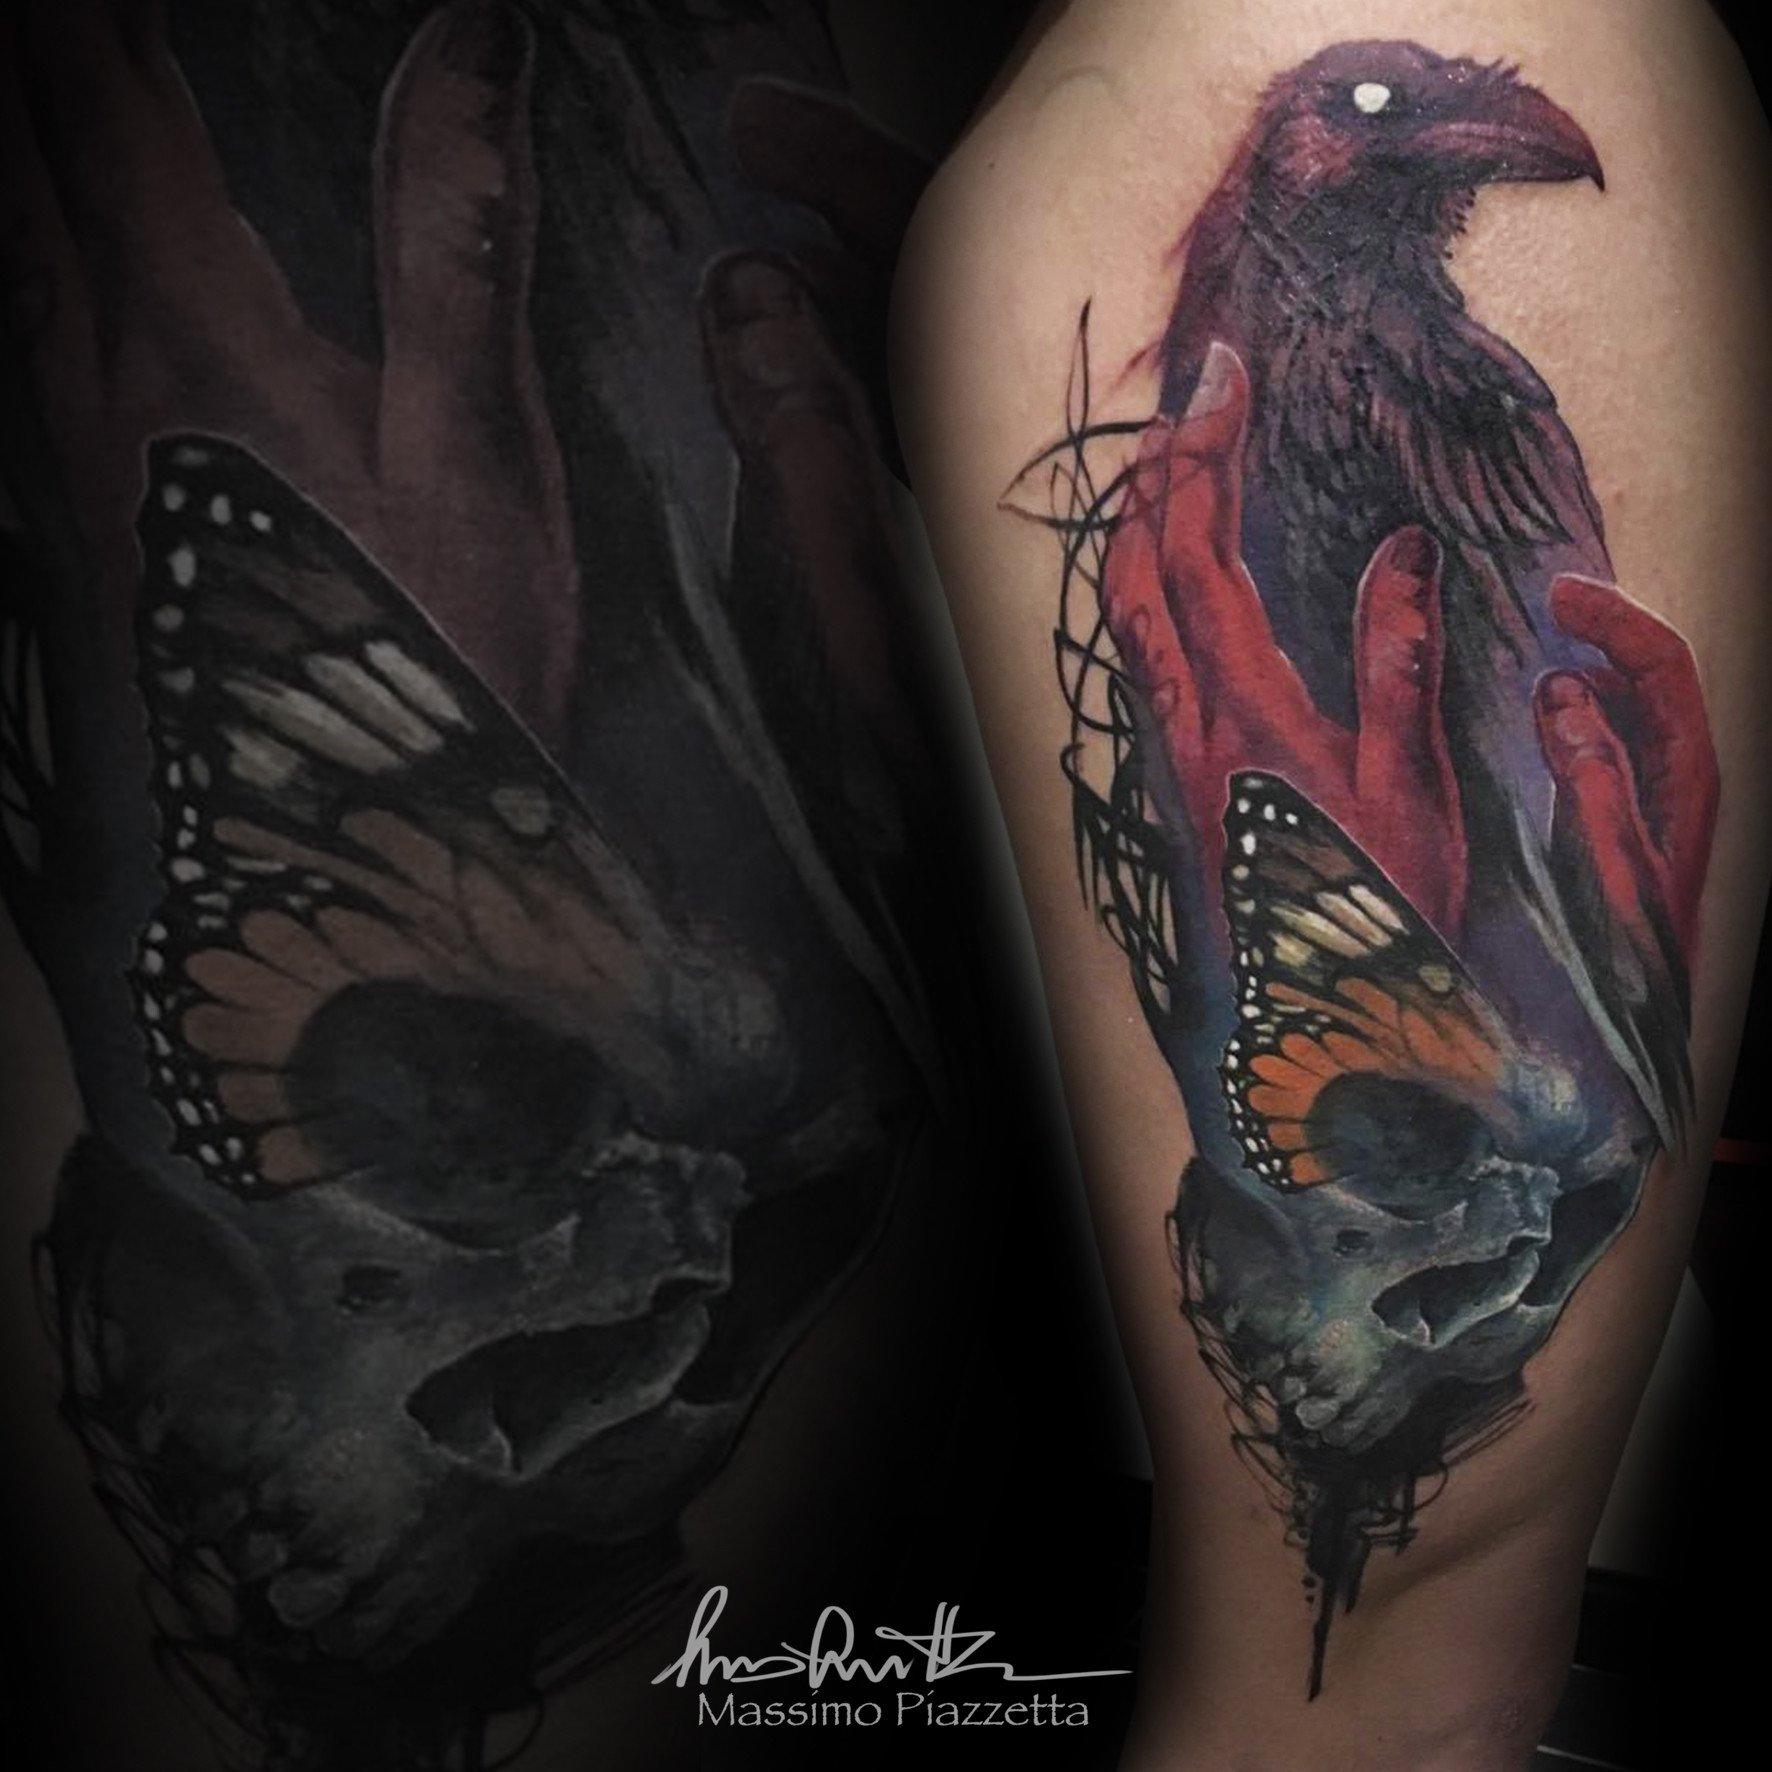 Massimo-PIazzetta-Tattoo-teschio-mani-corvo-Ligera-Ink-Studio-Tattoo-Milano-tatuaggi-Milano-realistico-realistic-tattoo-milano-Tatuaggi-Realistici-Milano